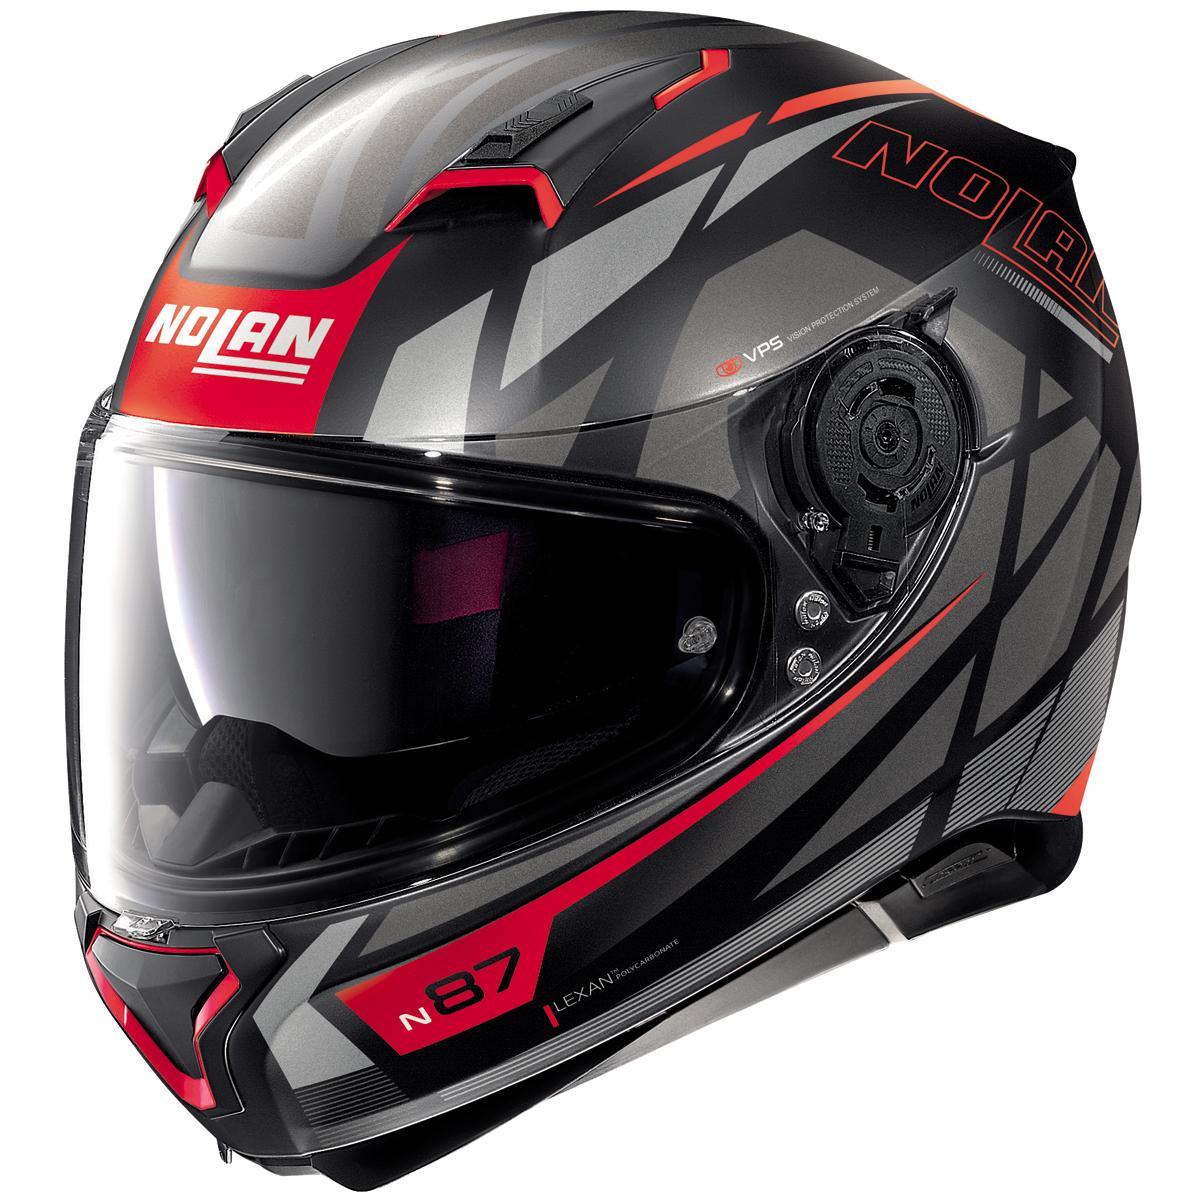 Casco NOLAN N87 Originality N-Com Flat Black / Red